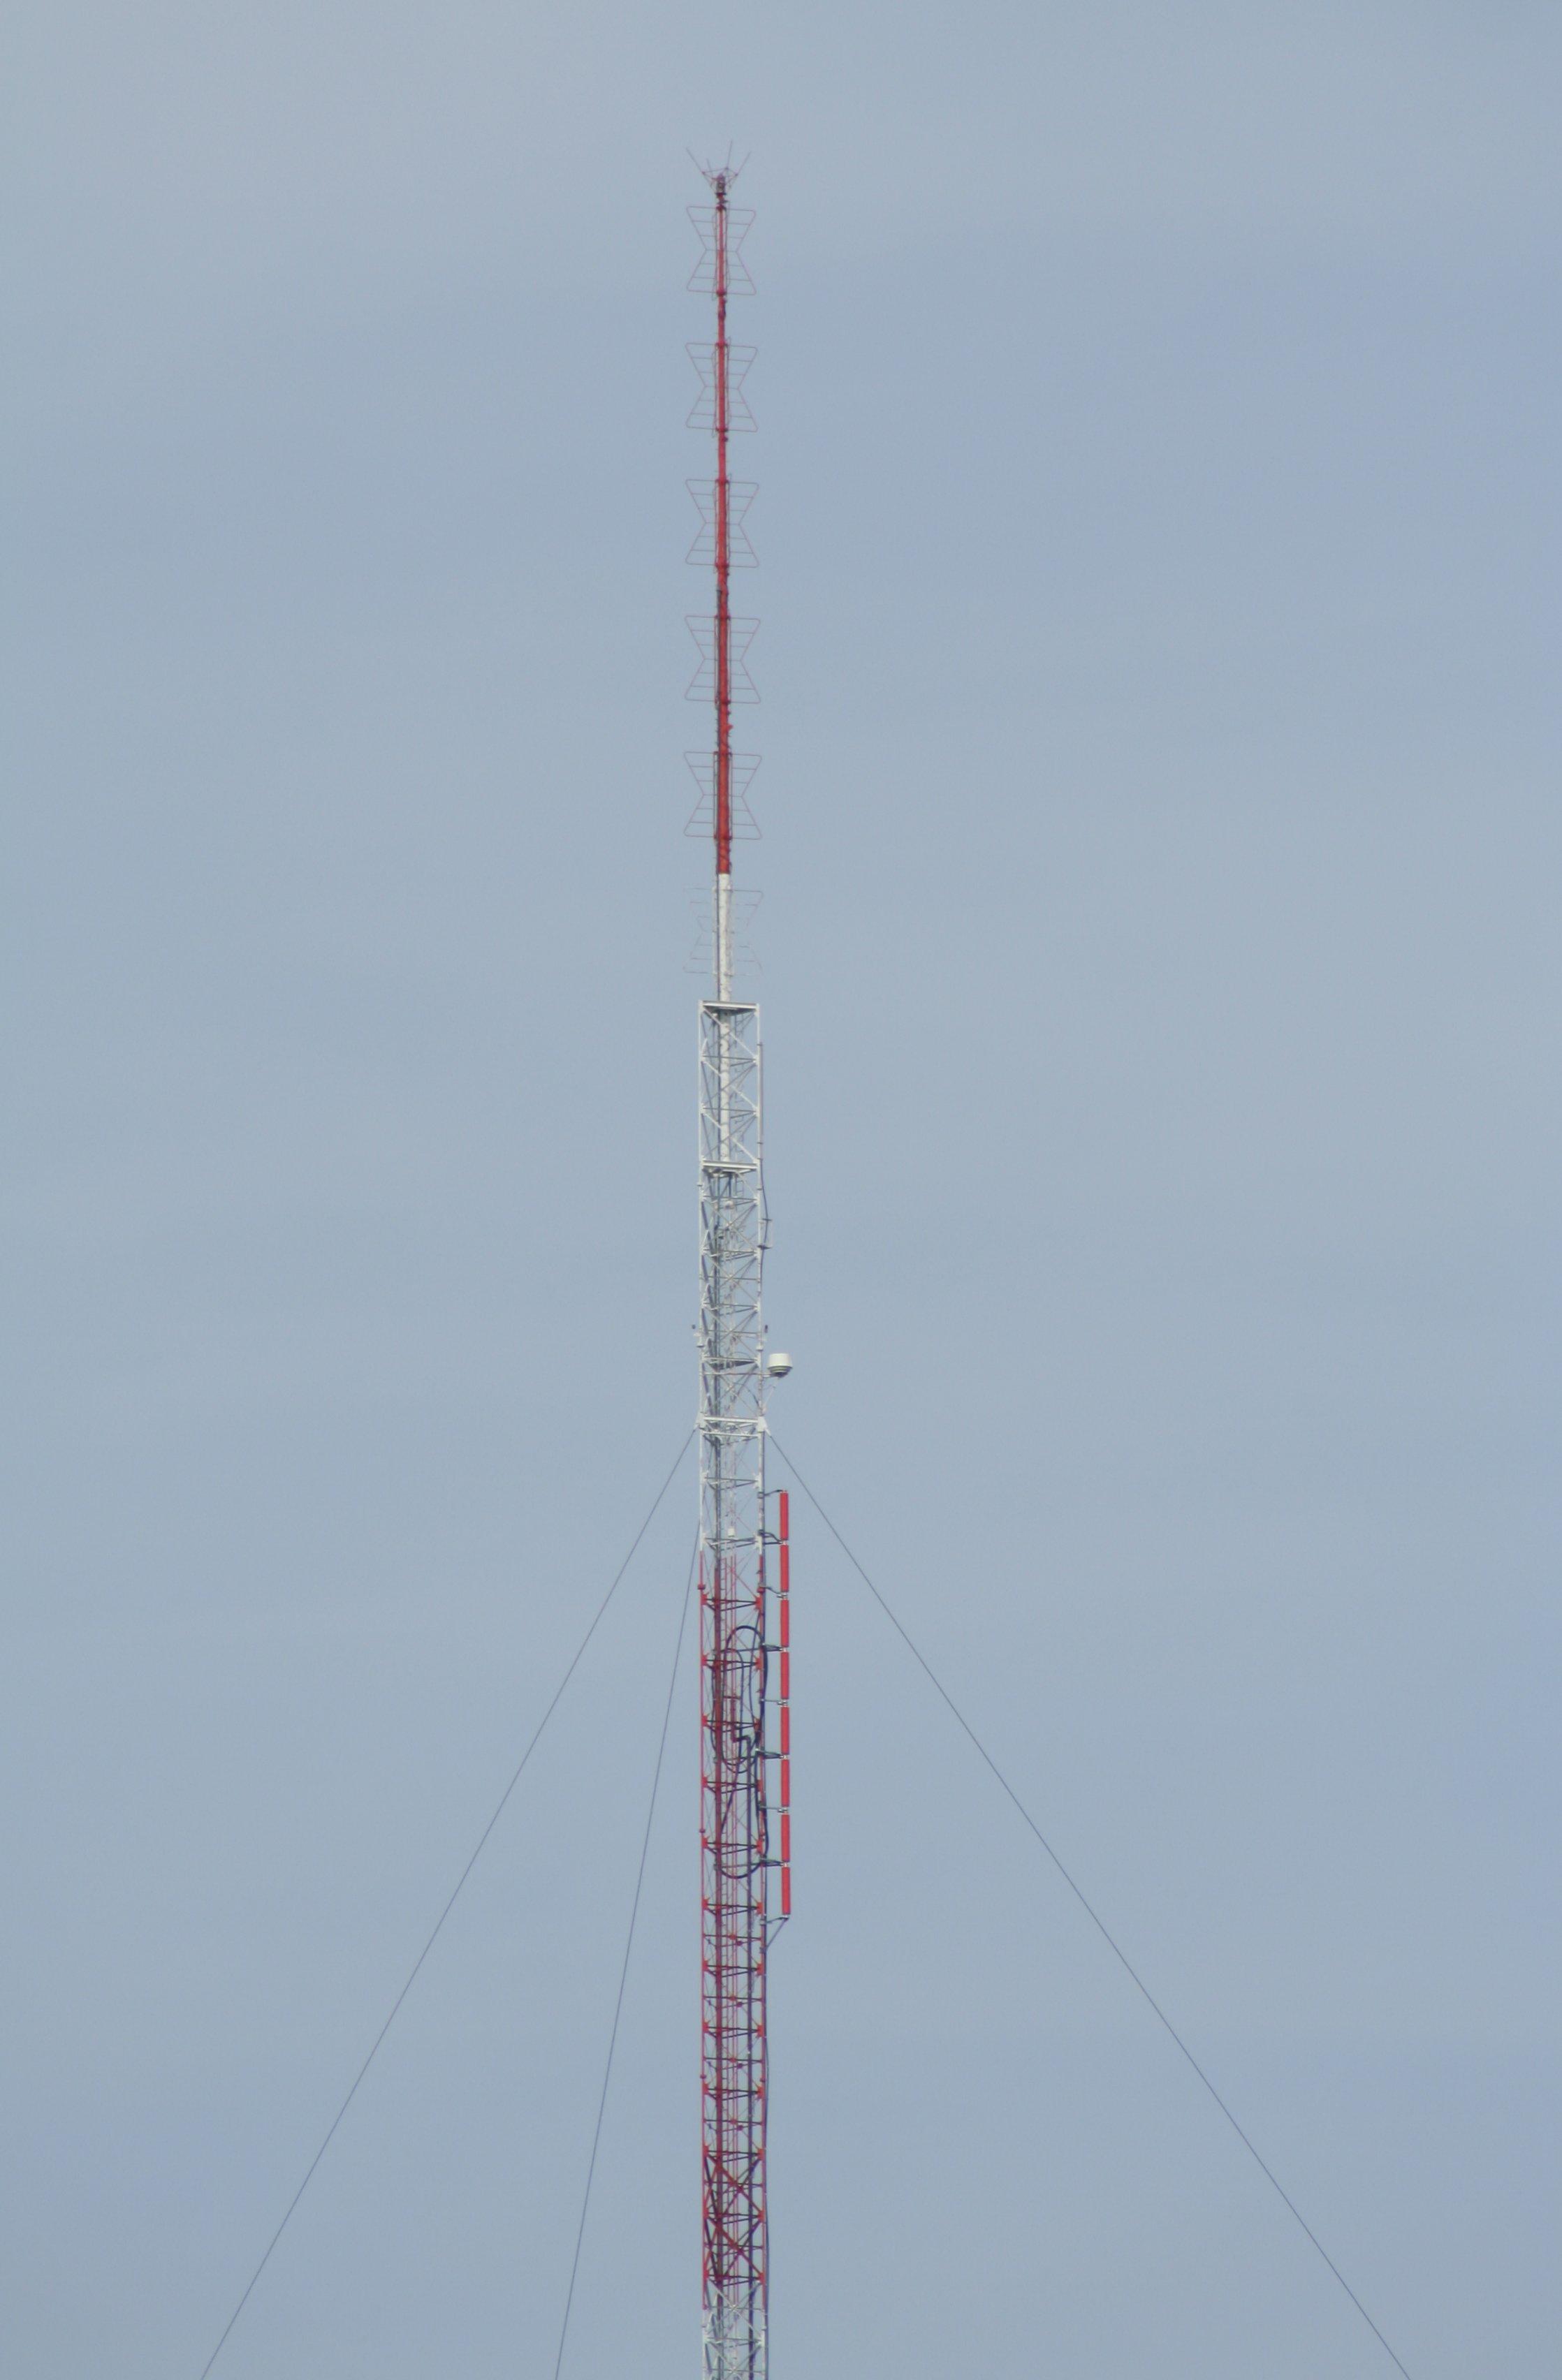 antenna tower bing images. Black Bedroom Furniture Sets. Home Design Ideas